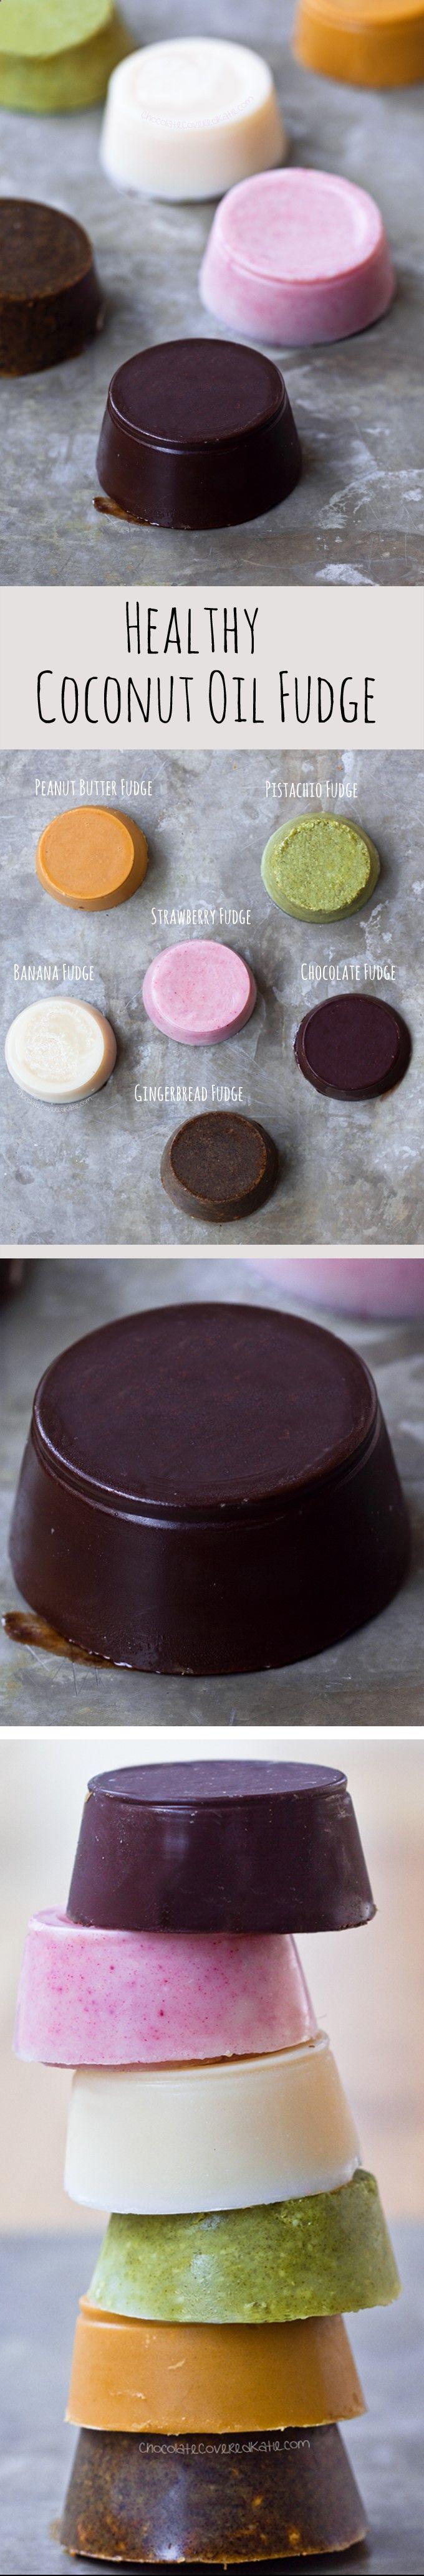 Coconut Oil Fudge - 3 Ingredients, healthy & vegan, EASY to make - FLAVORS include chocolate, pistachio, peanut butter: chocolatecoveredk... Chocolate Covered Katie